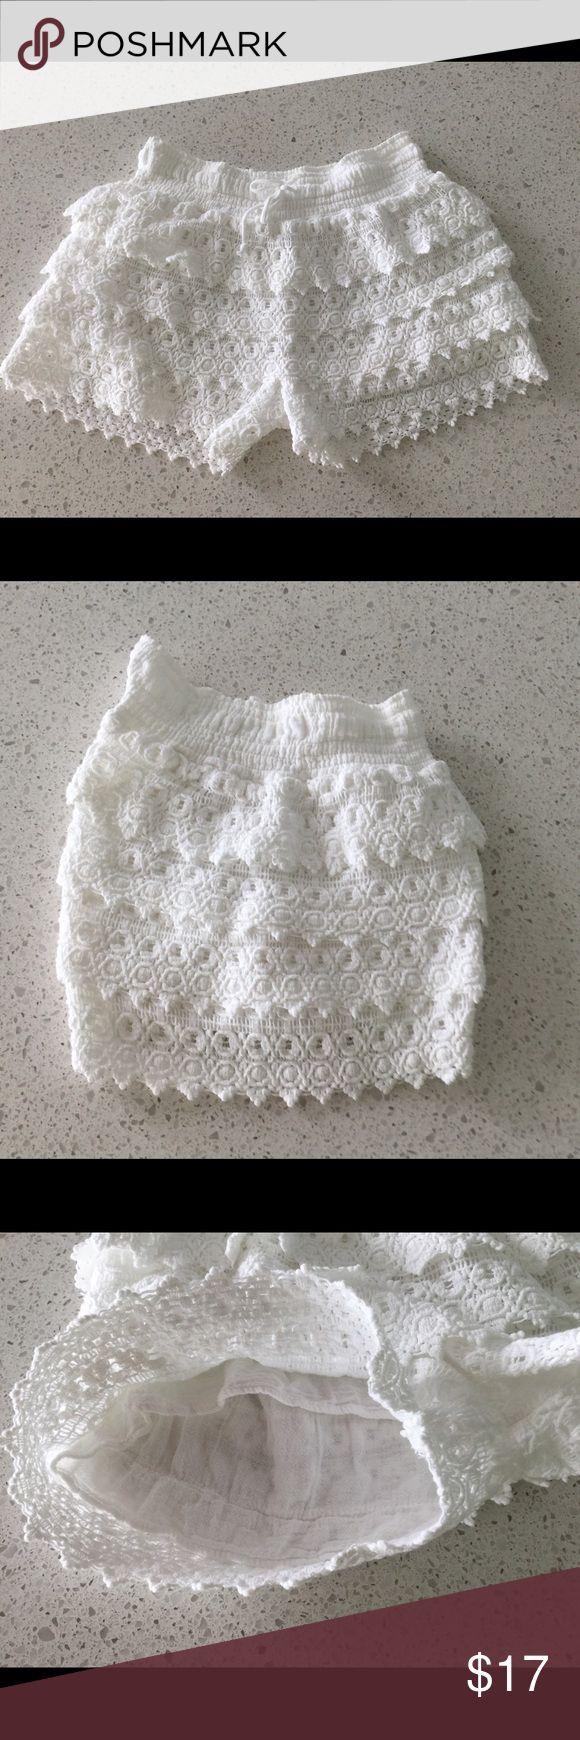 Juniors' Crochet Shortie Shorts With an eye-catching crocheted design, these juniors' shortie shorts define feminine style. Elastic waistband Crocheted design Scalloped hem Shorts